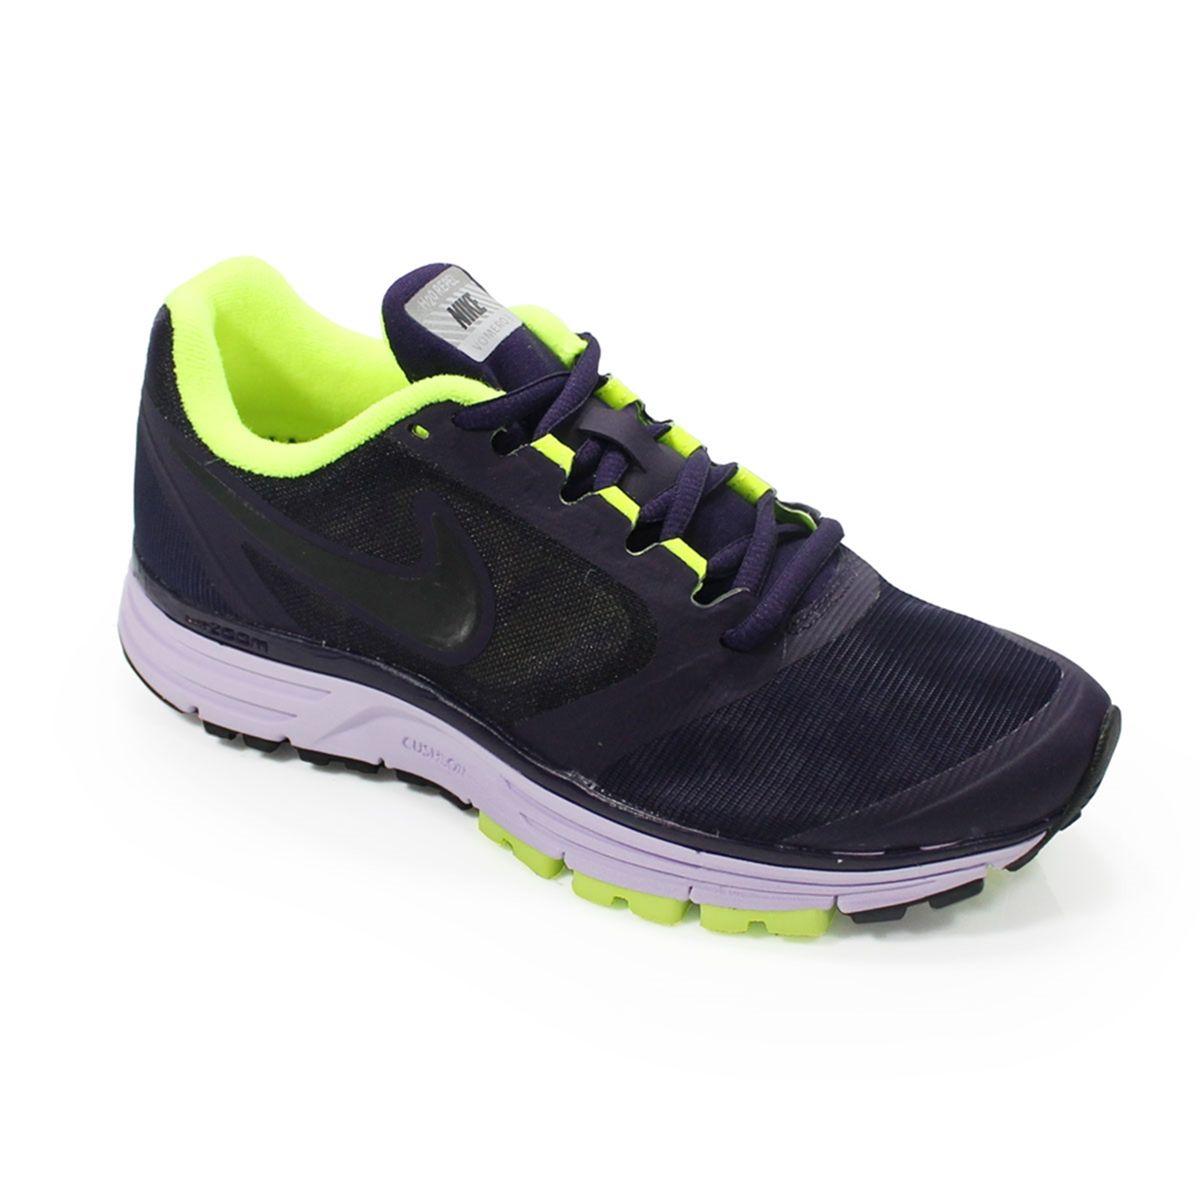 37e64a78d40 Tênis Nike Zoom Vomero 8+ Shield Feminino. Lindo!  nike  corrida  running   run  fastrunner  runner  tenis  treino  bonstreinos